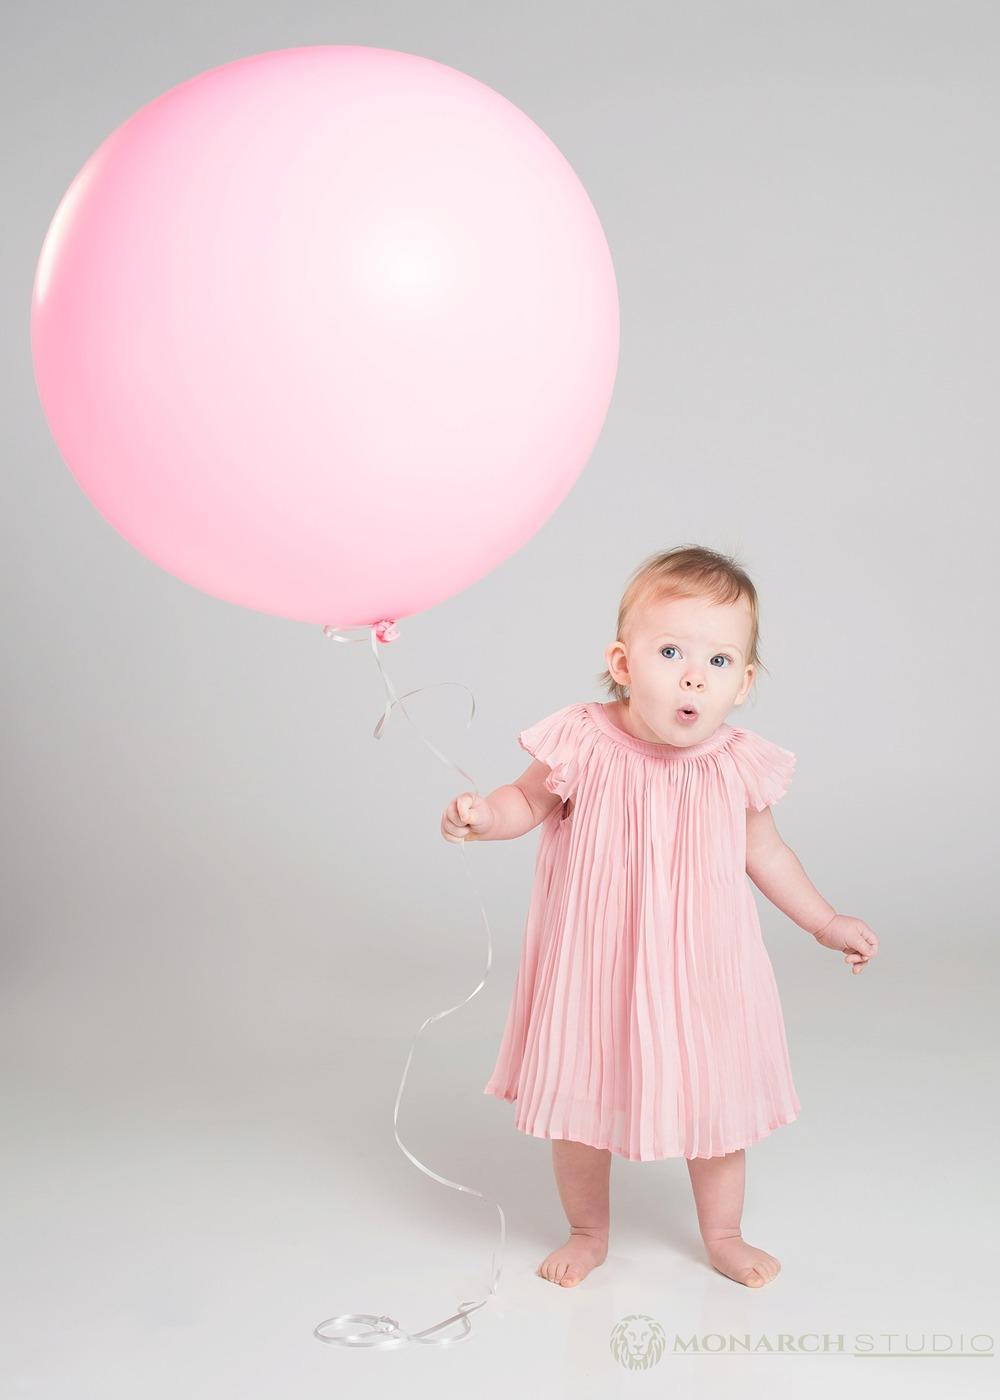 First-Birthday-Smash-Cake-Photography-Monarch-Studio-St-Augustine-Florida_0018.jpg